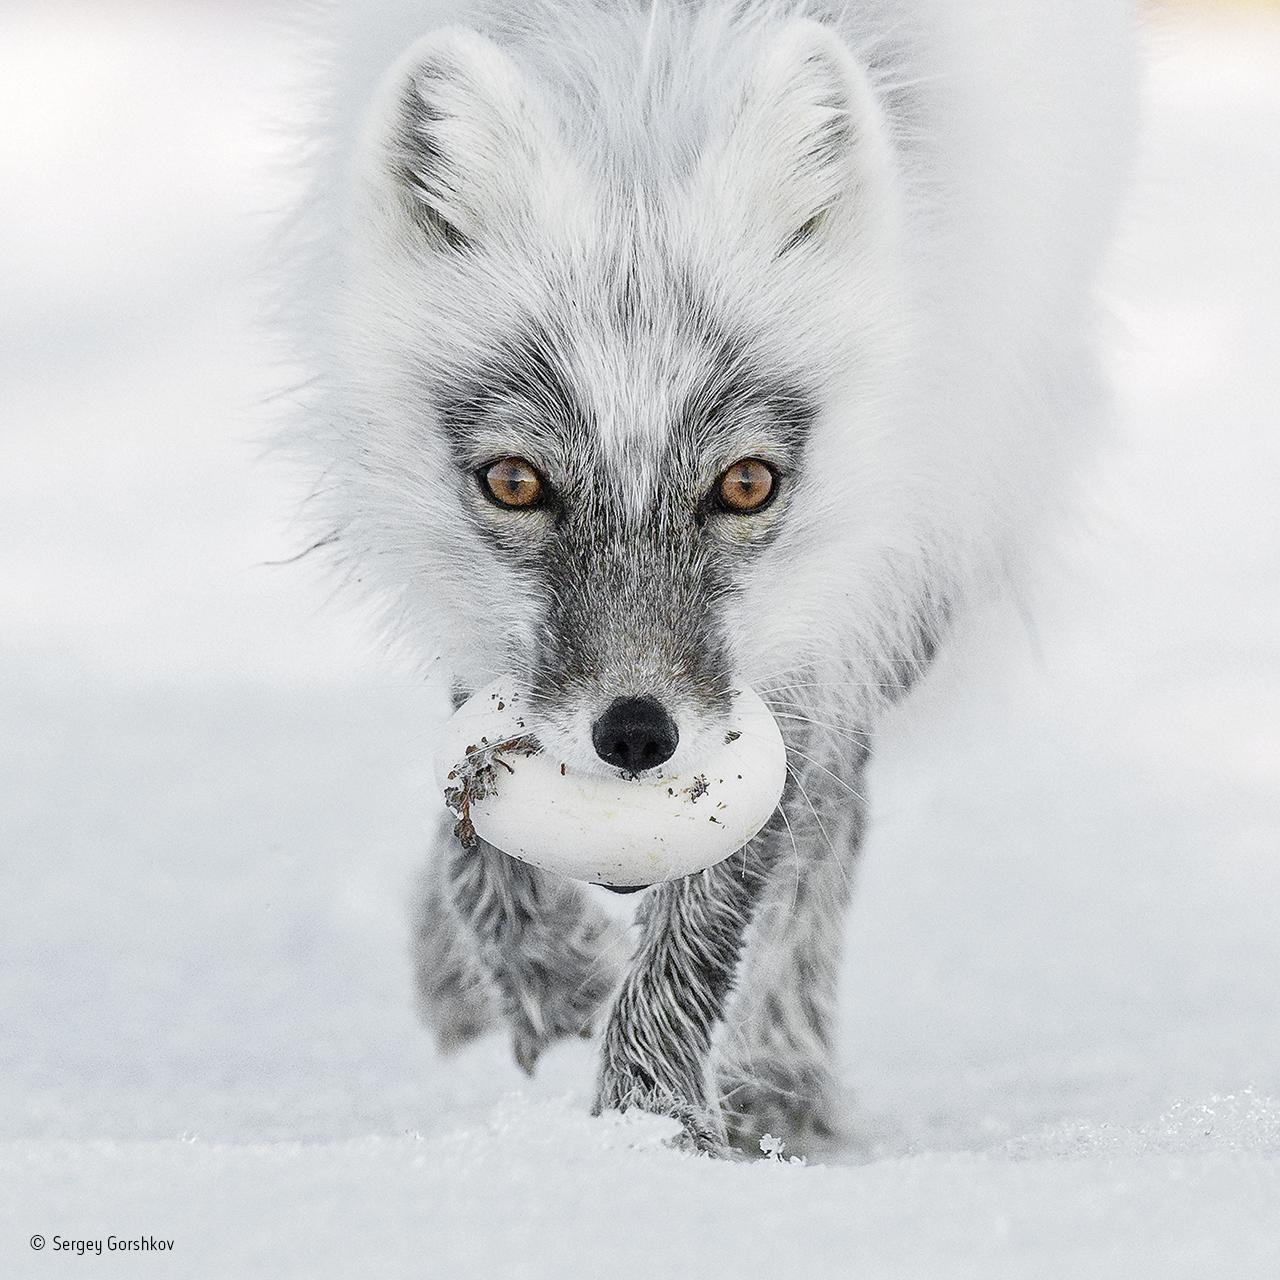 Photo of an Arctic fox with an egg